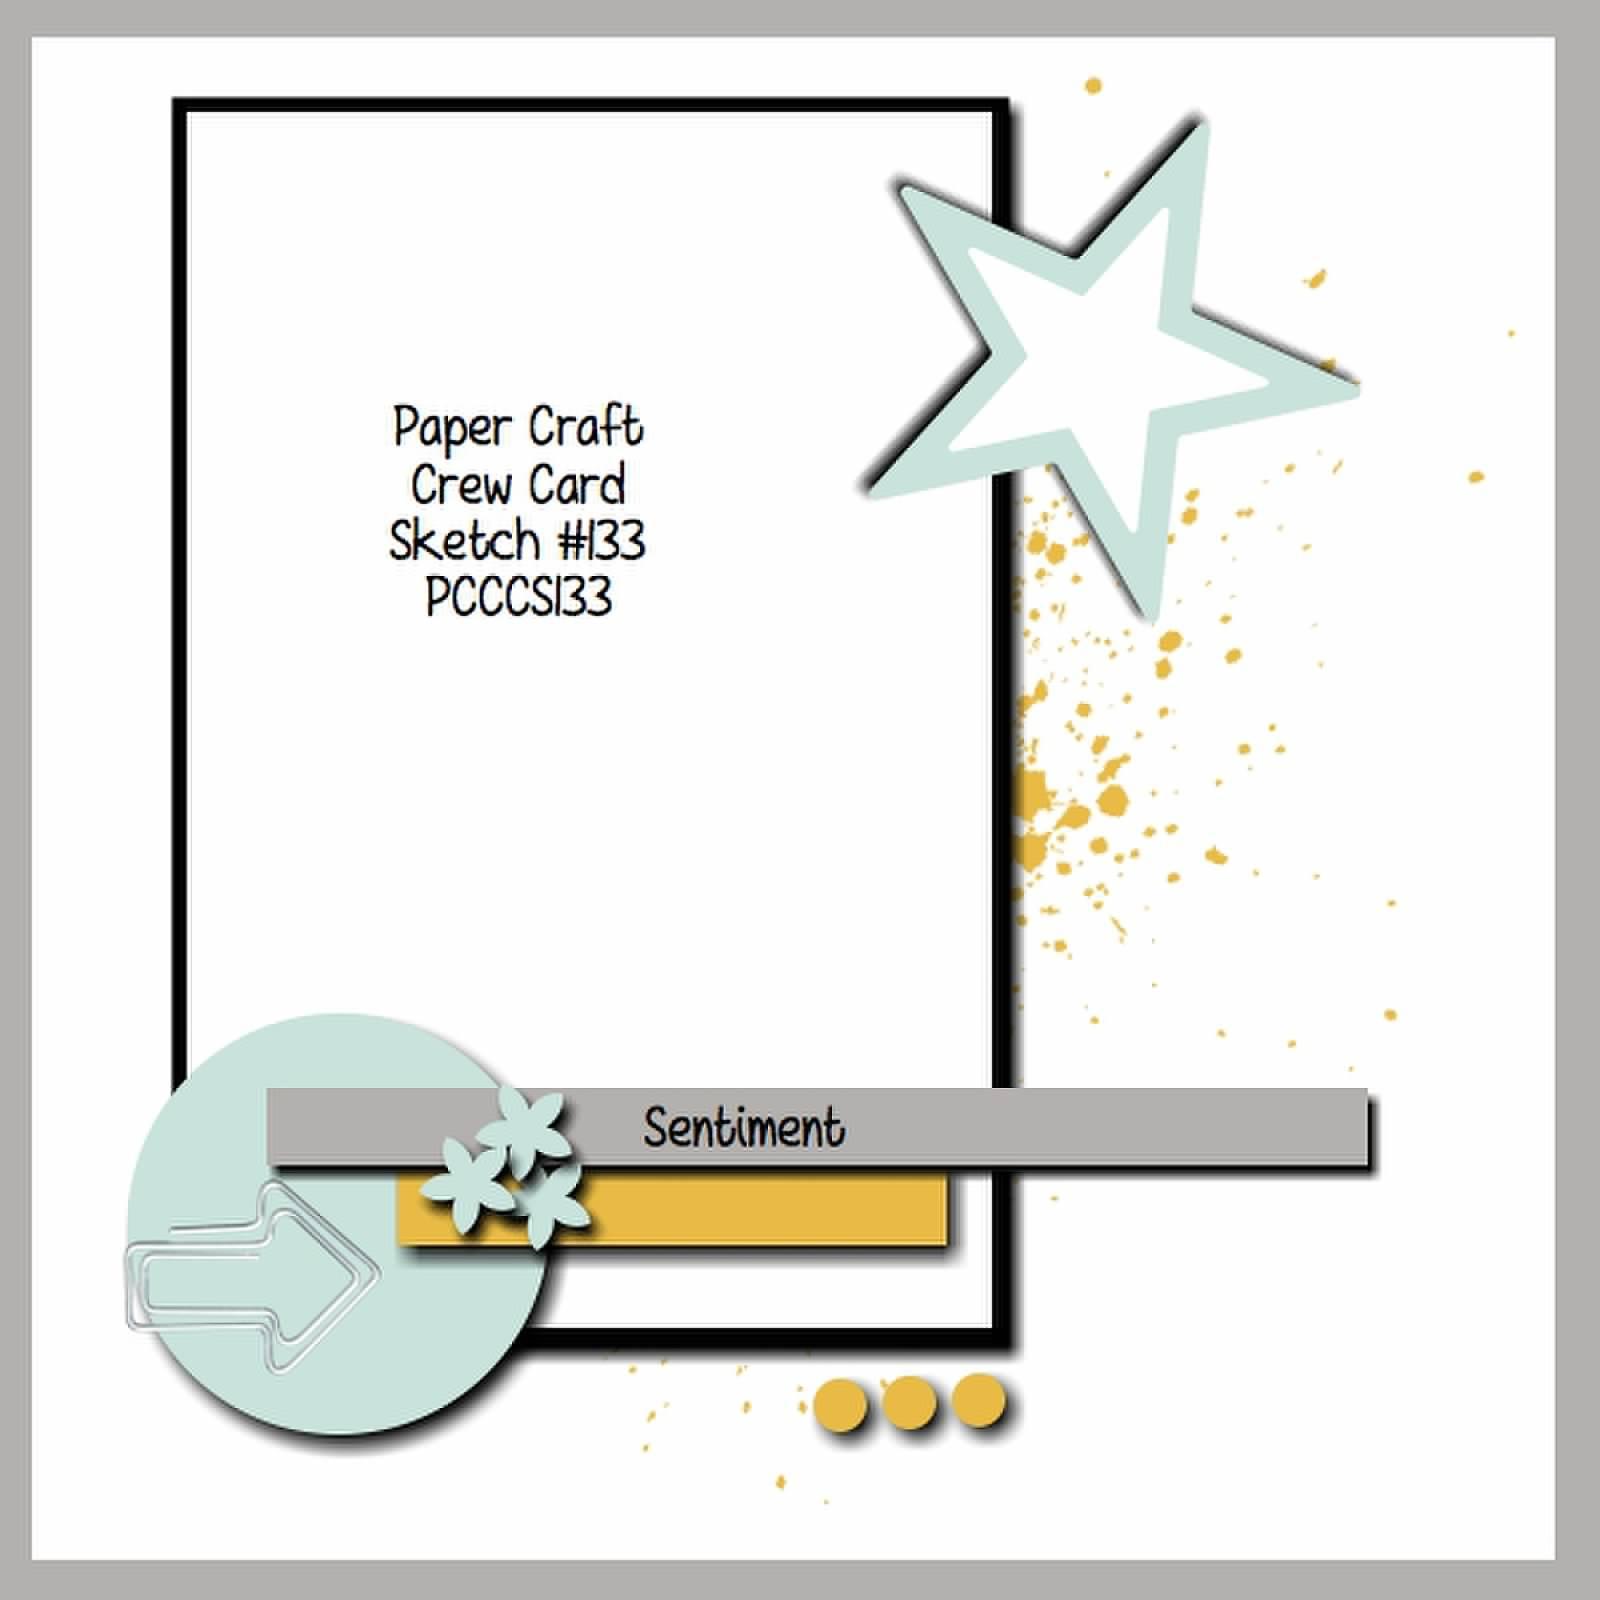 Paper Craft Crew card sketch 133